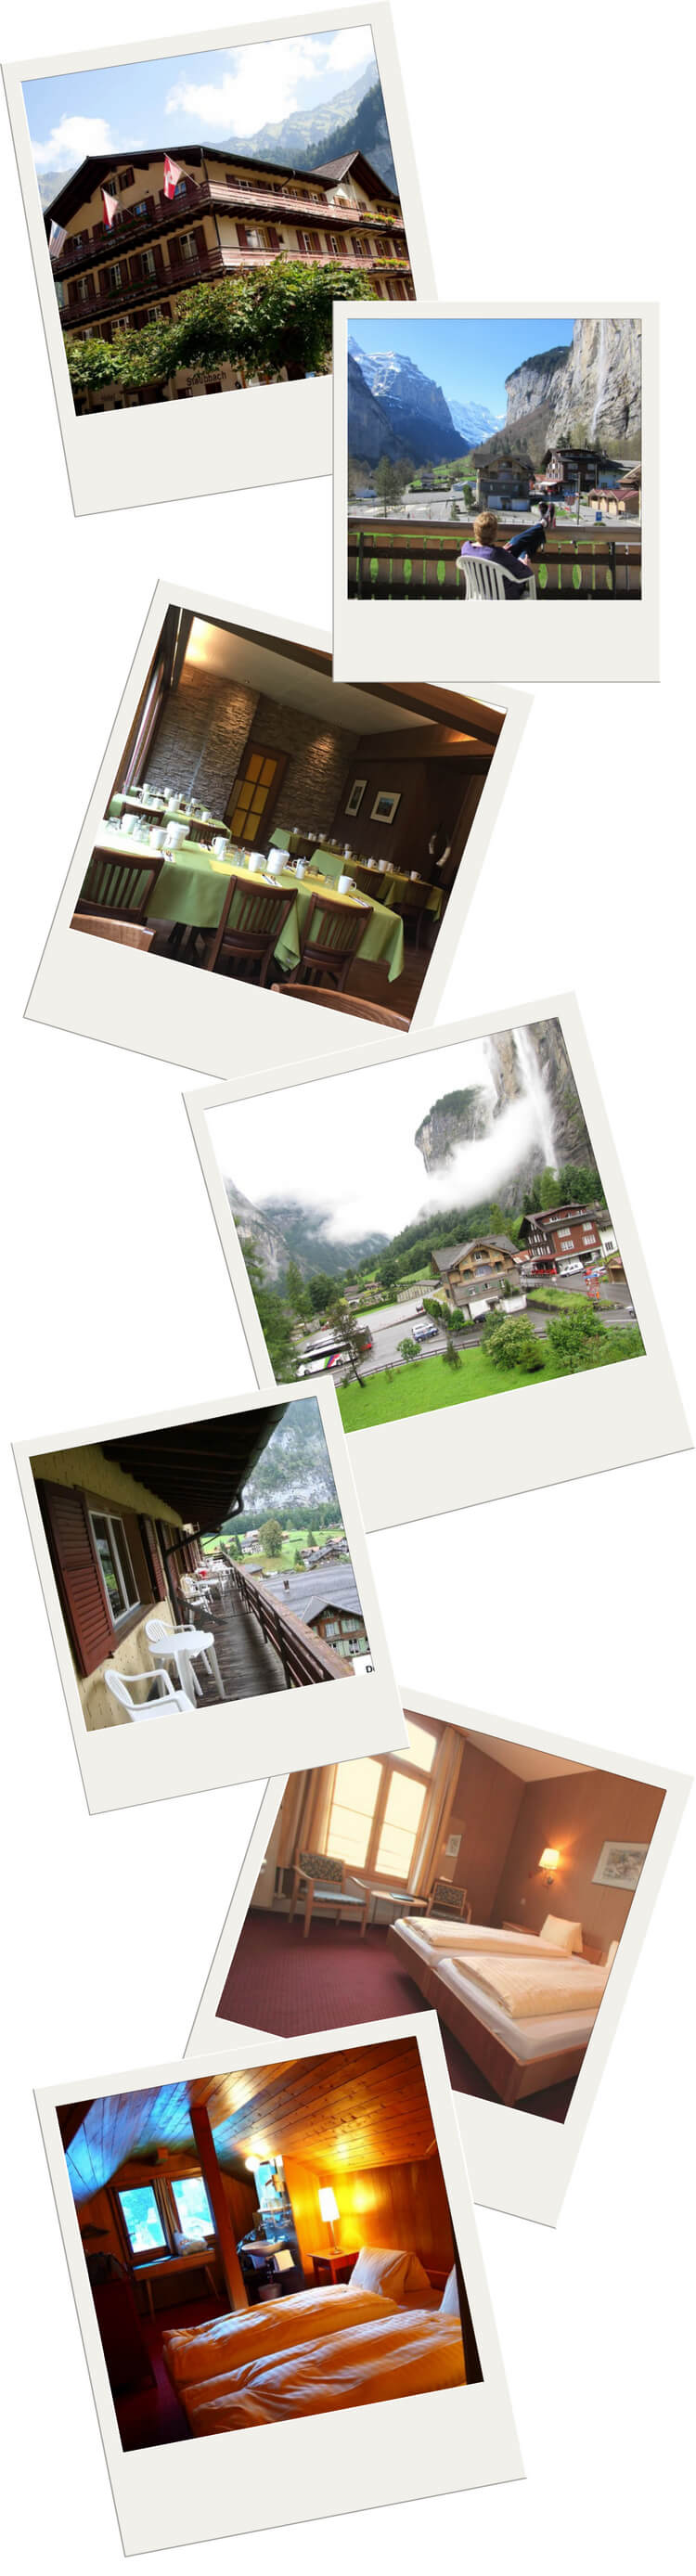 Staubbach-Hotel-Swiss-Lauterbrunnen